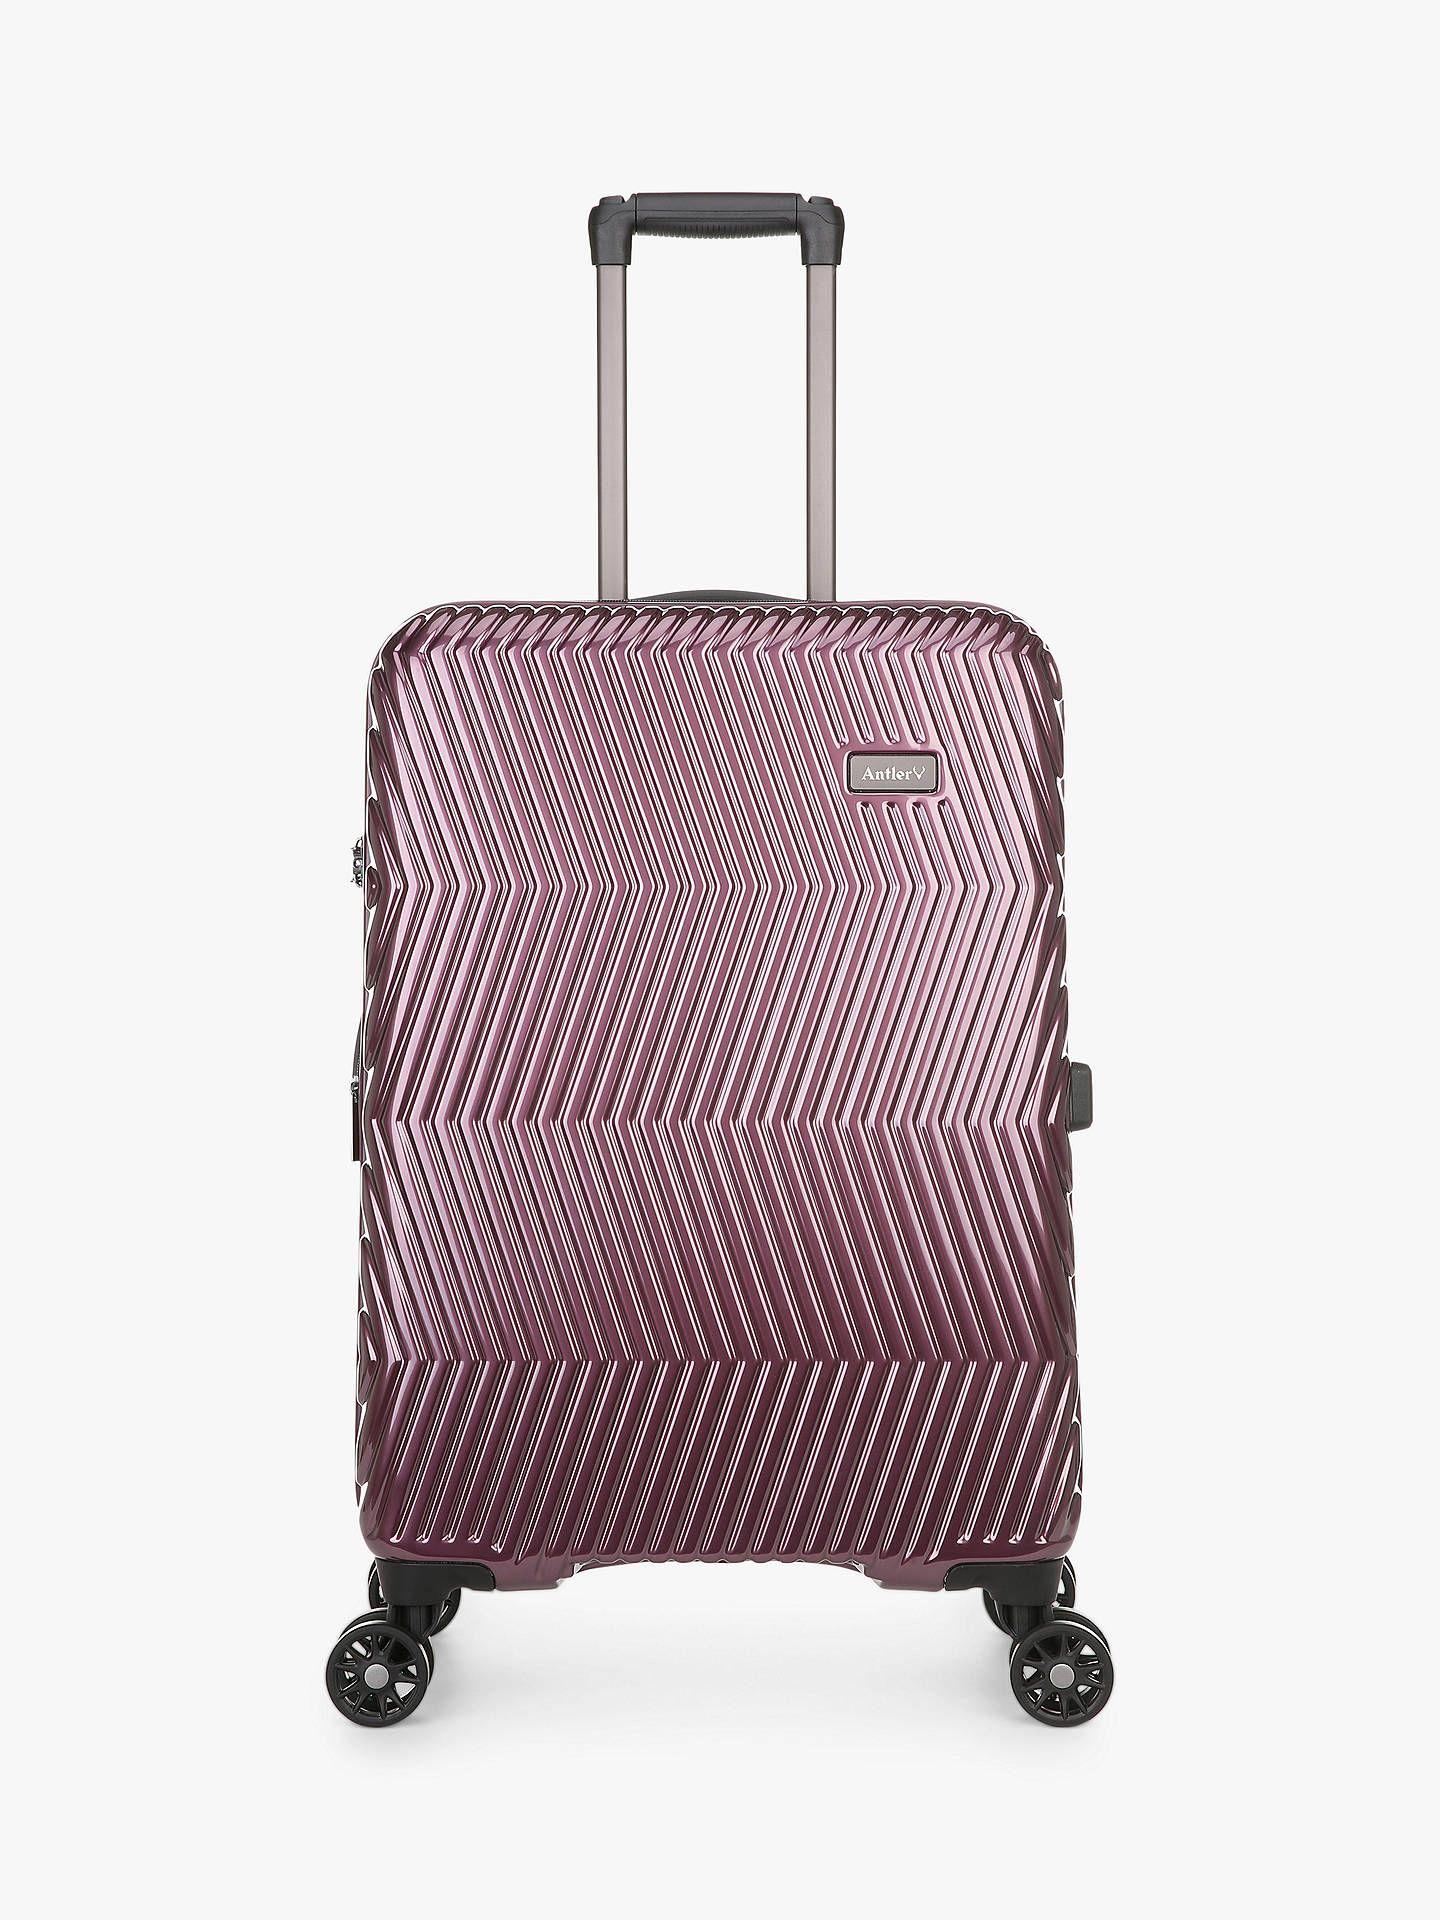 Antler Viva 4-Wheel 68cm Medium Suitcase, Aubergine at John Lewis & Partners for £65.50